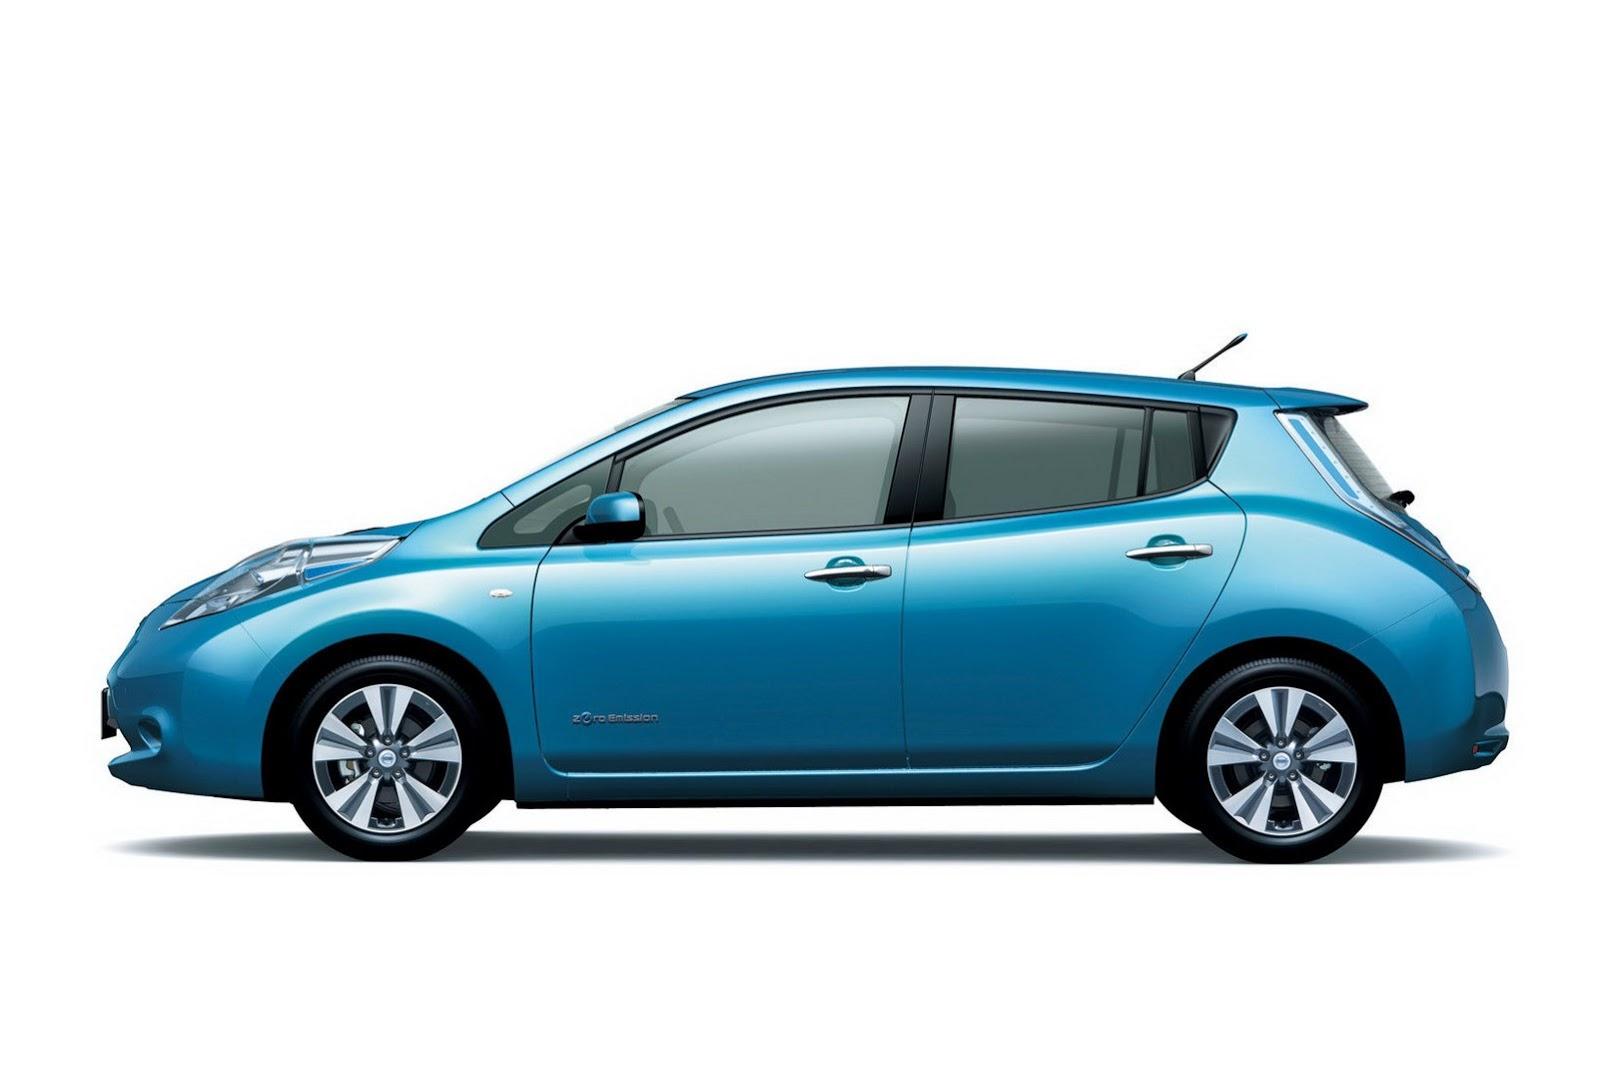 2013-Nissan-Leaf-11%25255B2%25255D.jpg